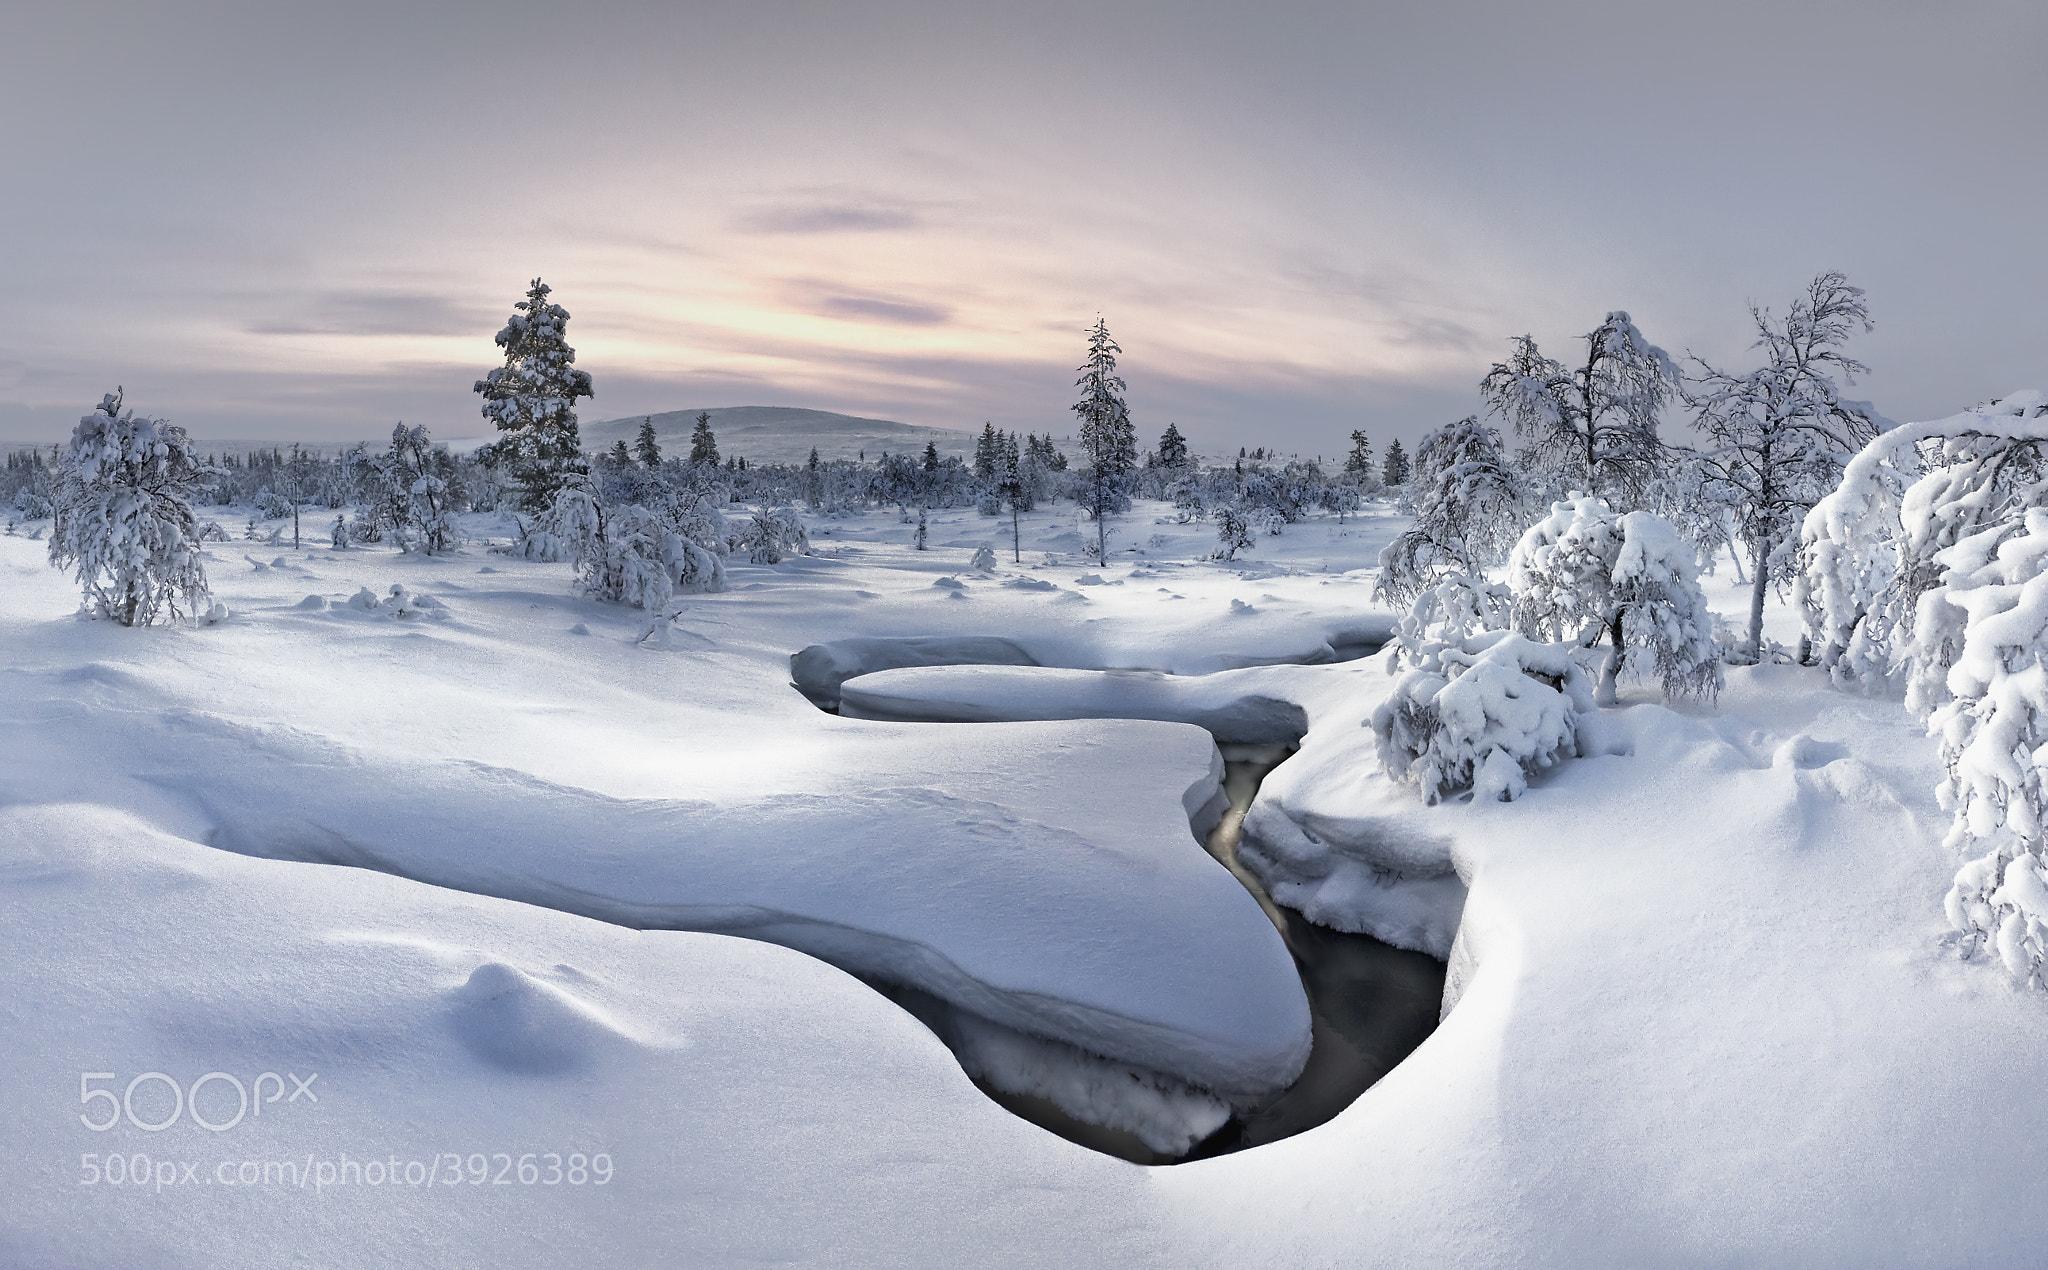 Photograph Lapland - Kiilopää by Christian Schweiger on 500px